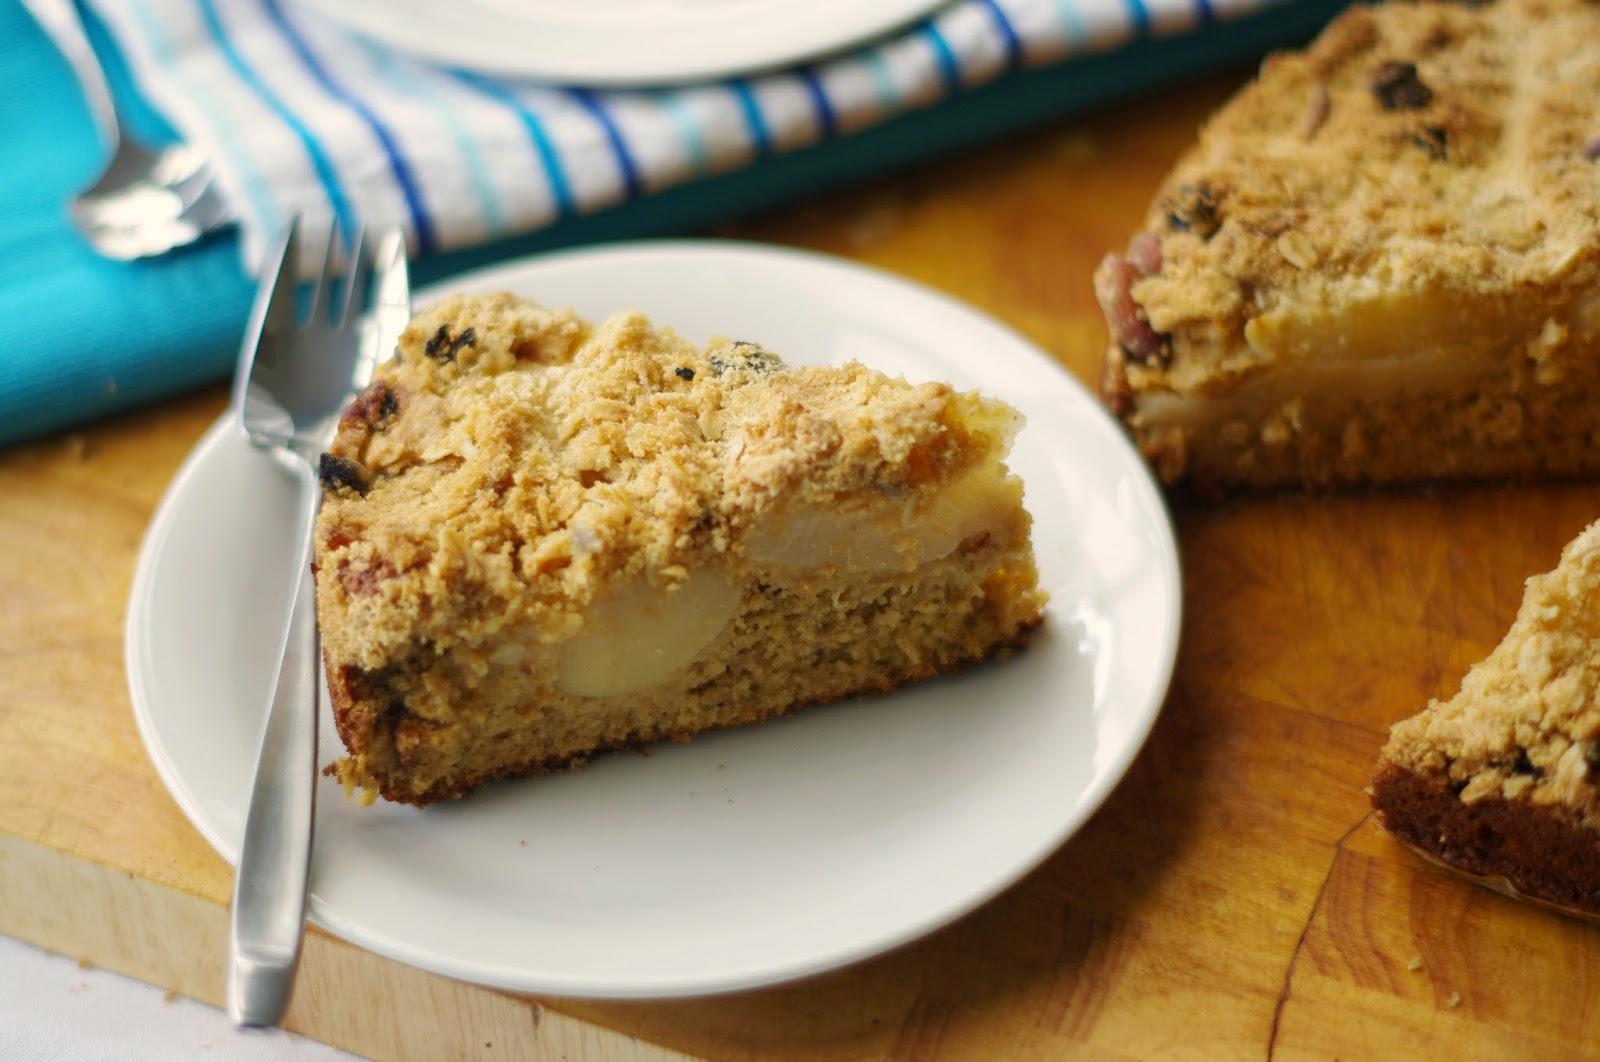 Cake Recipes Using Muesli